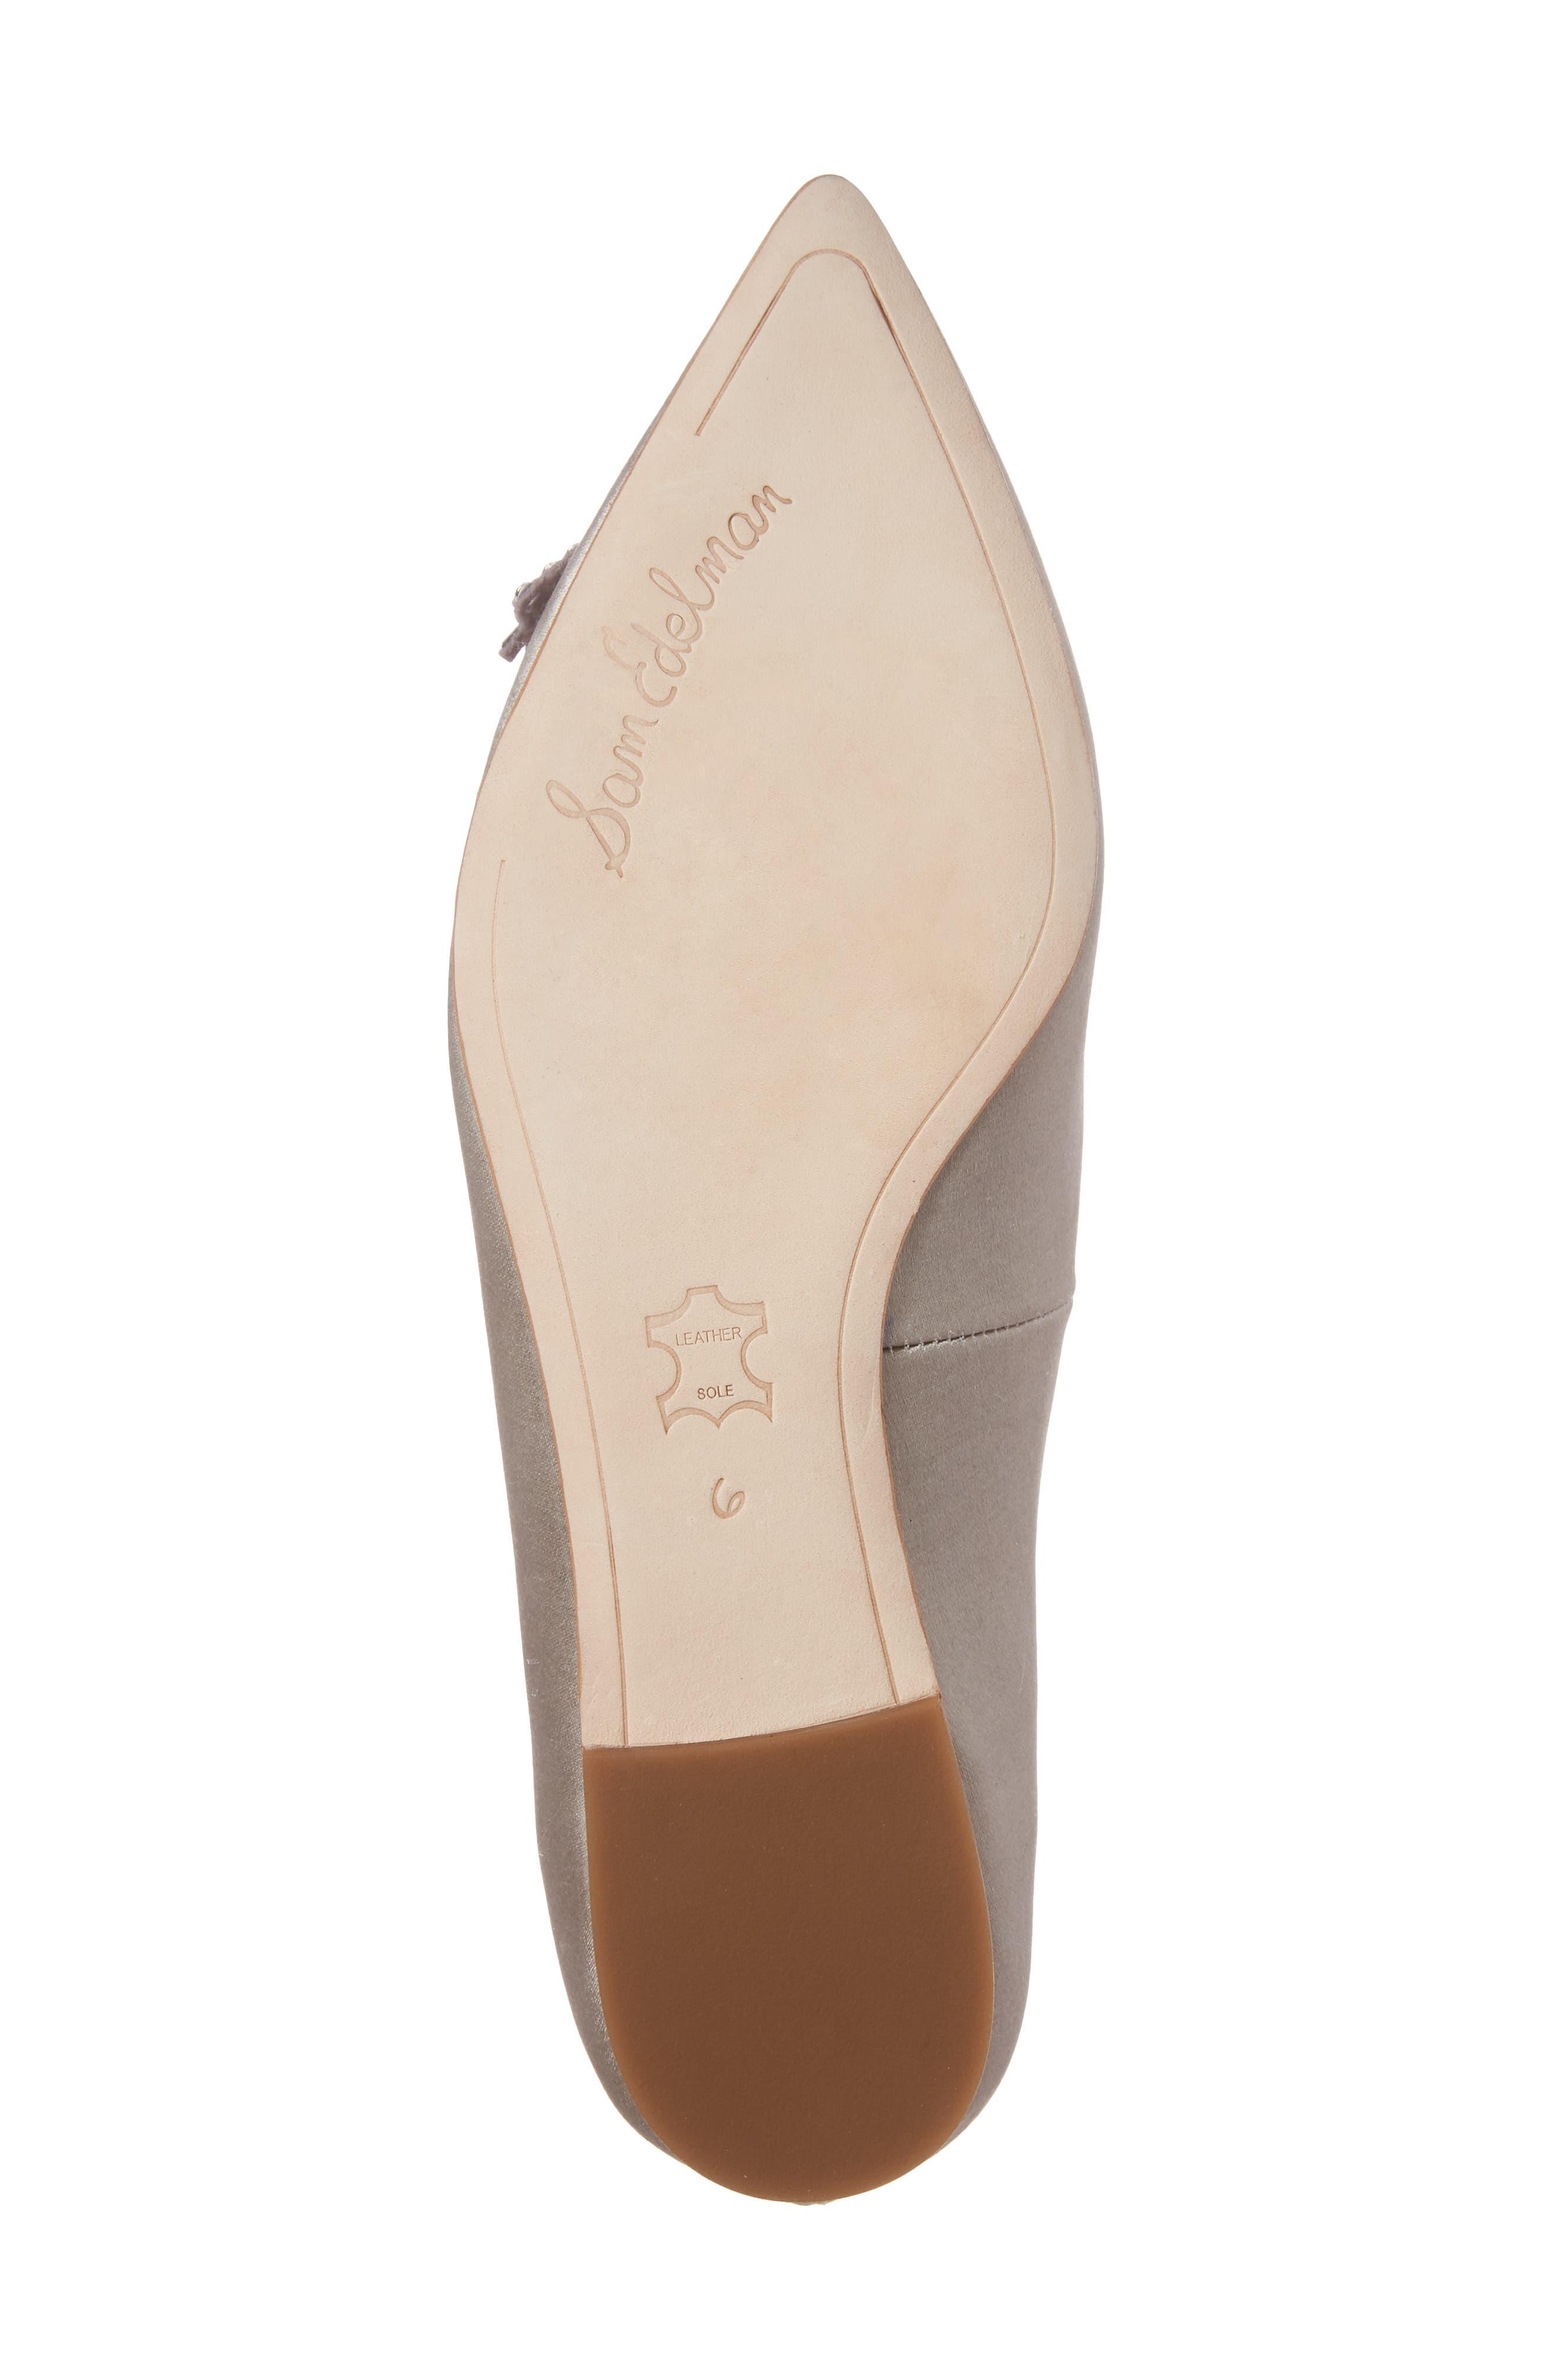 Rafaella Pointy Toe Ballet Flat,                             Alternate thumbnail 6, color,                             020